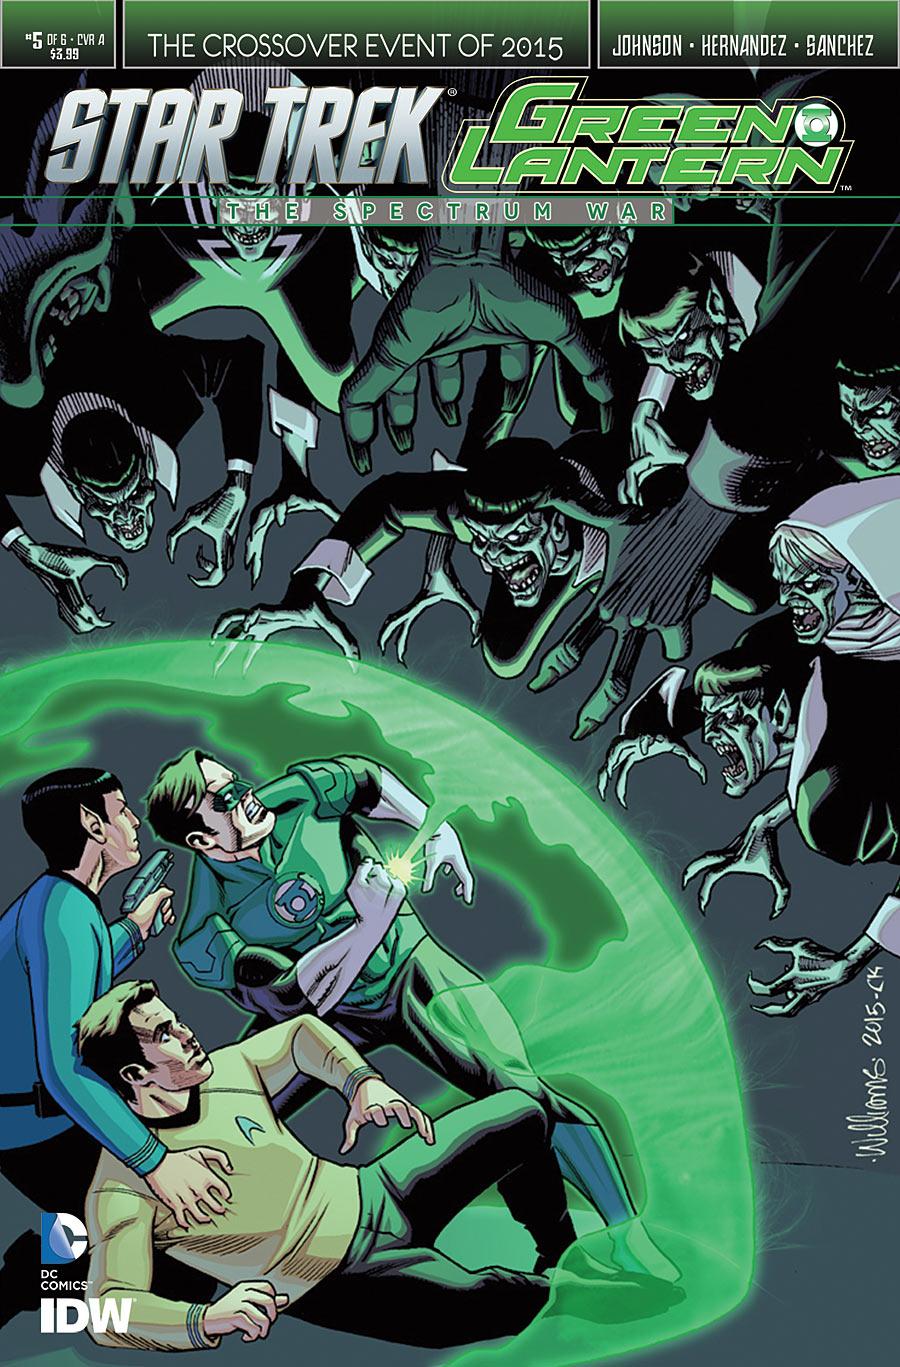 IDW November Star Trek Green Lantern cover by BroHawk